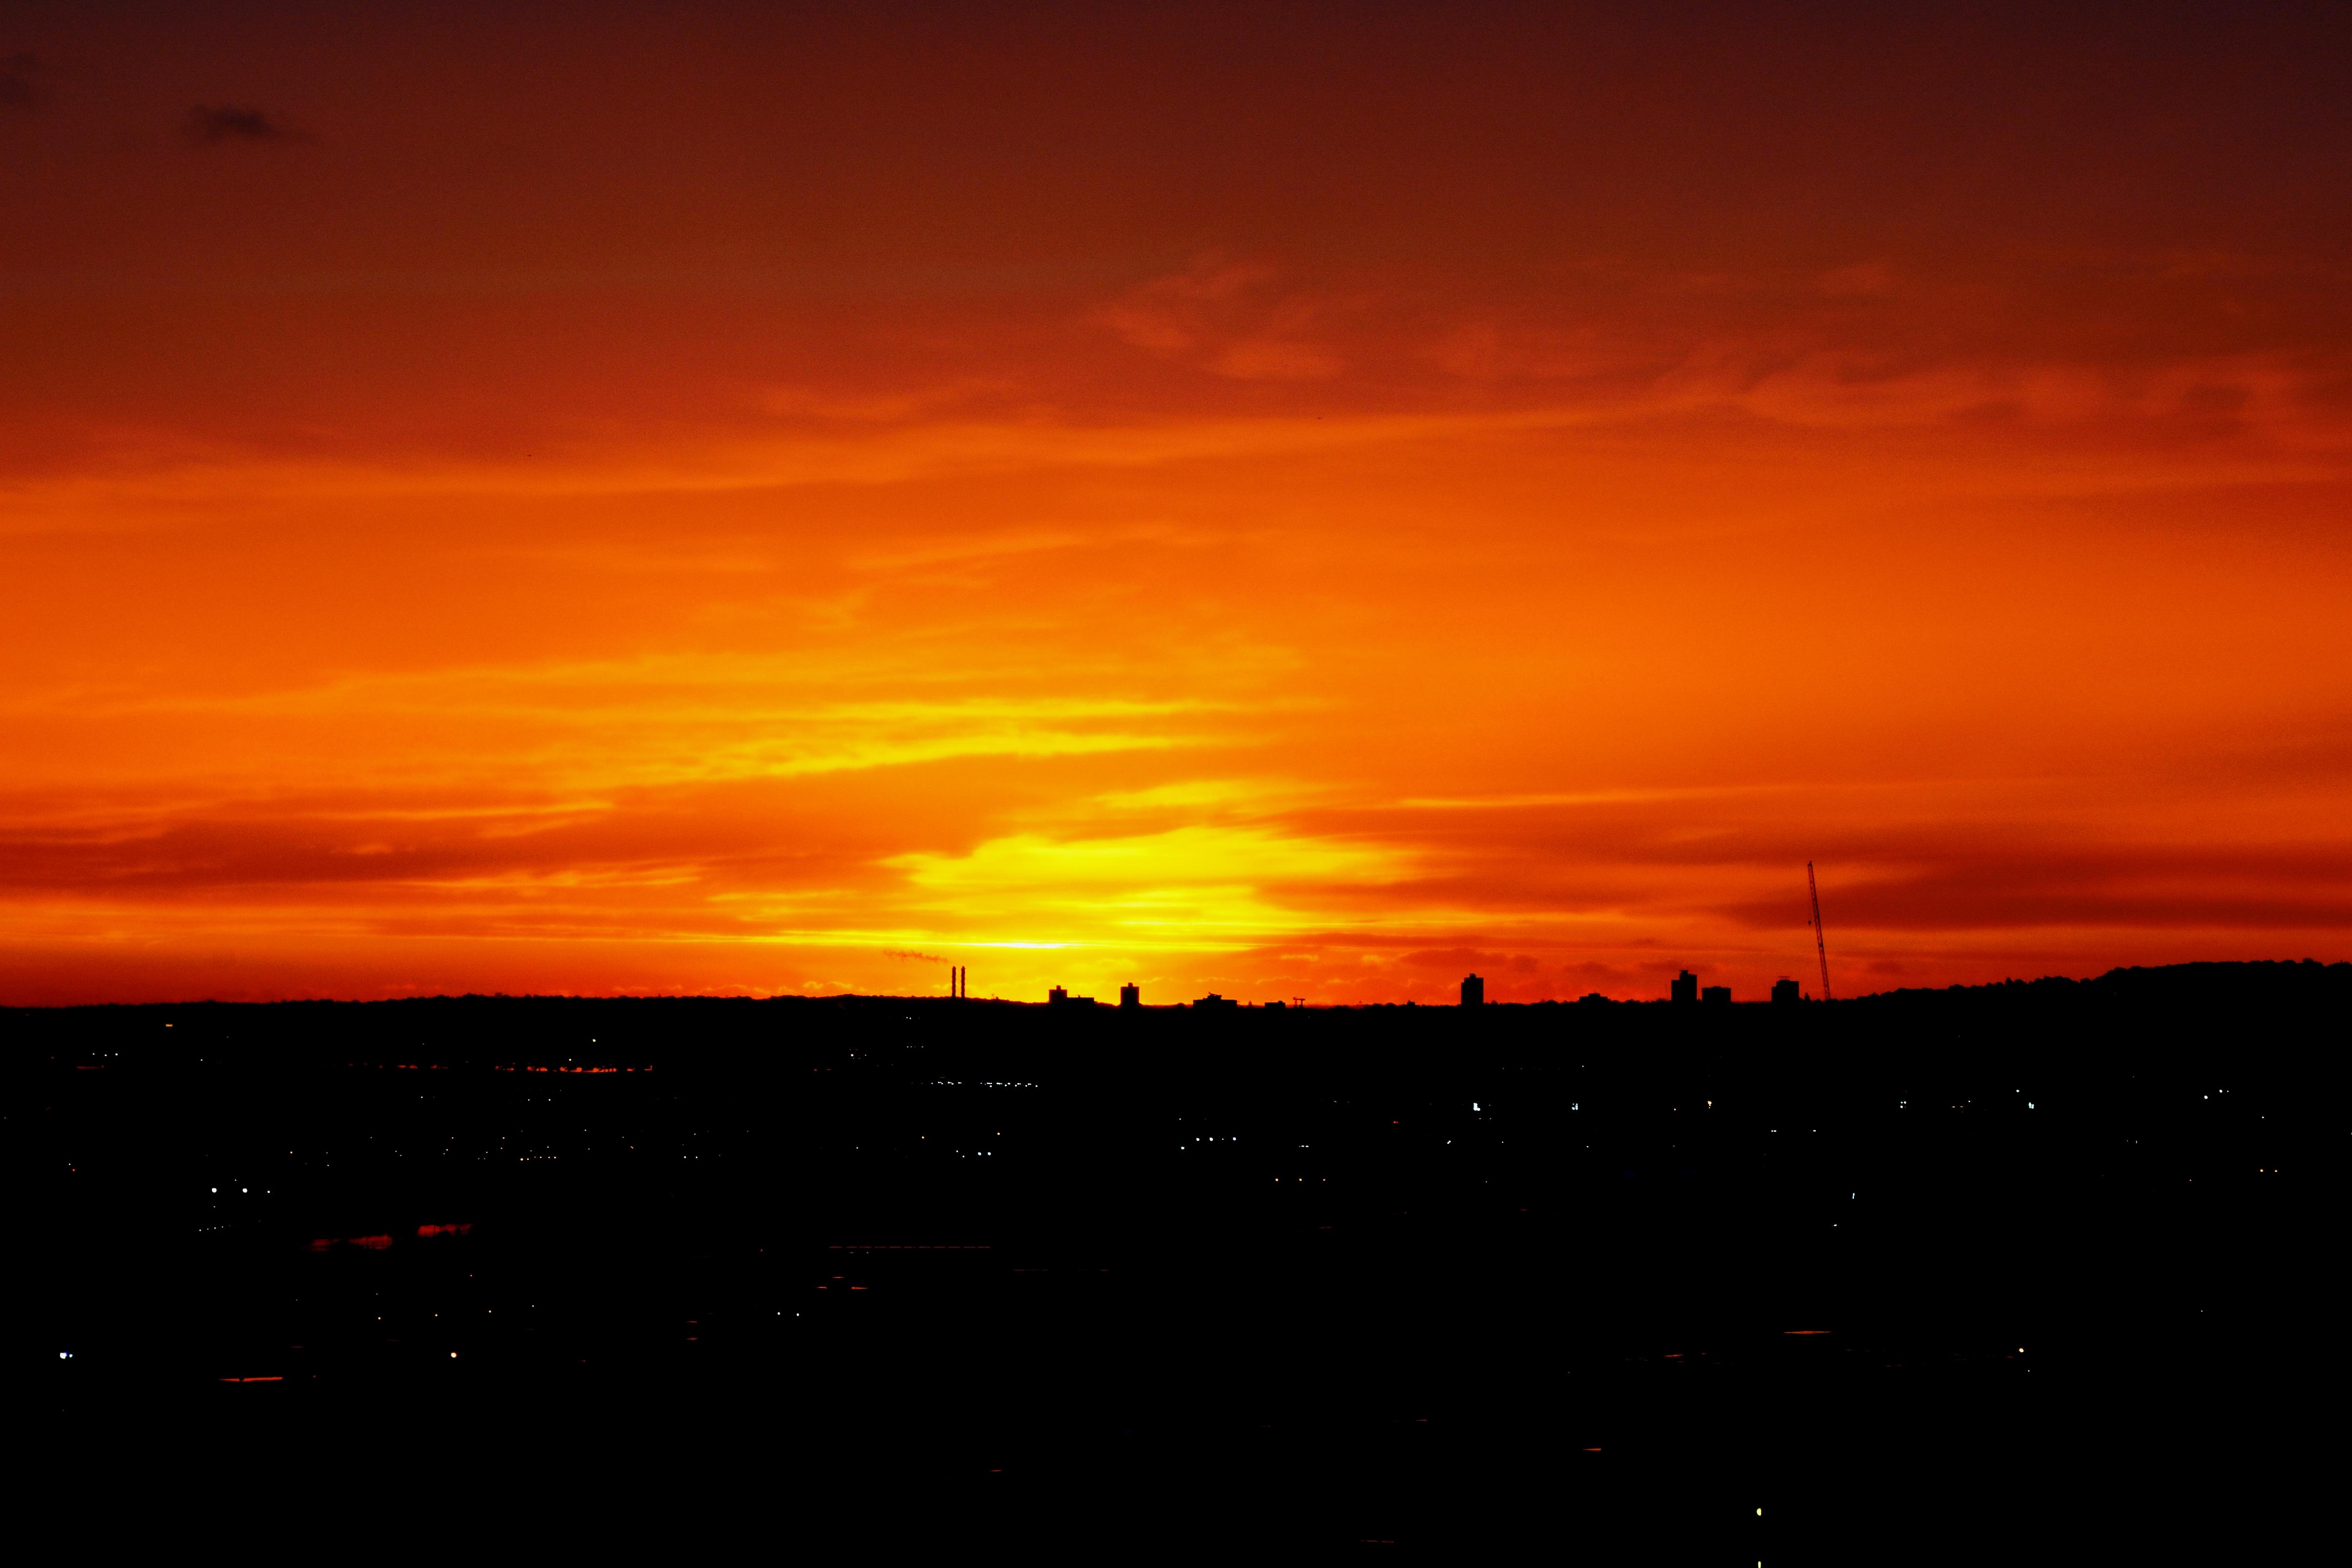 Sunrise, Evening and Sunset | UK OnLine In Poplar